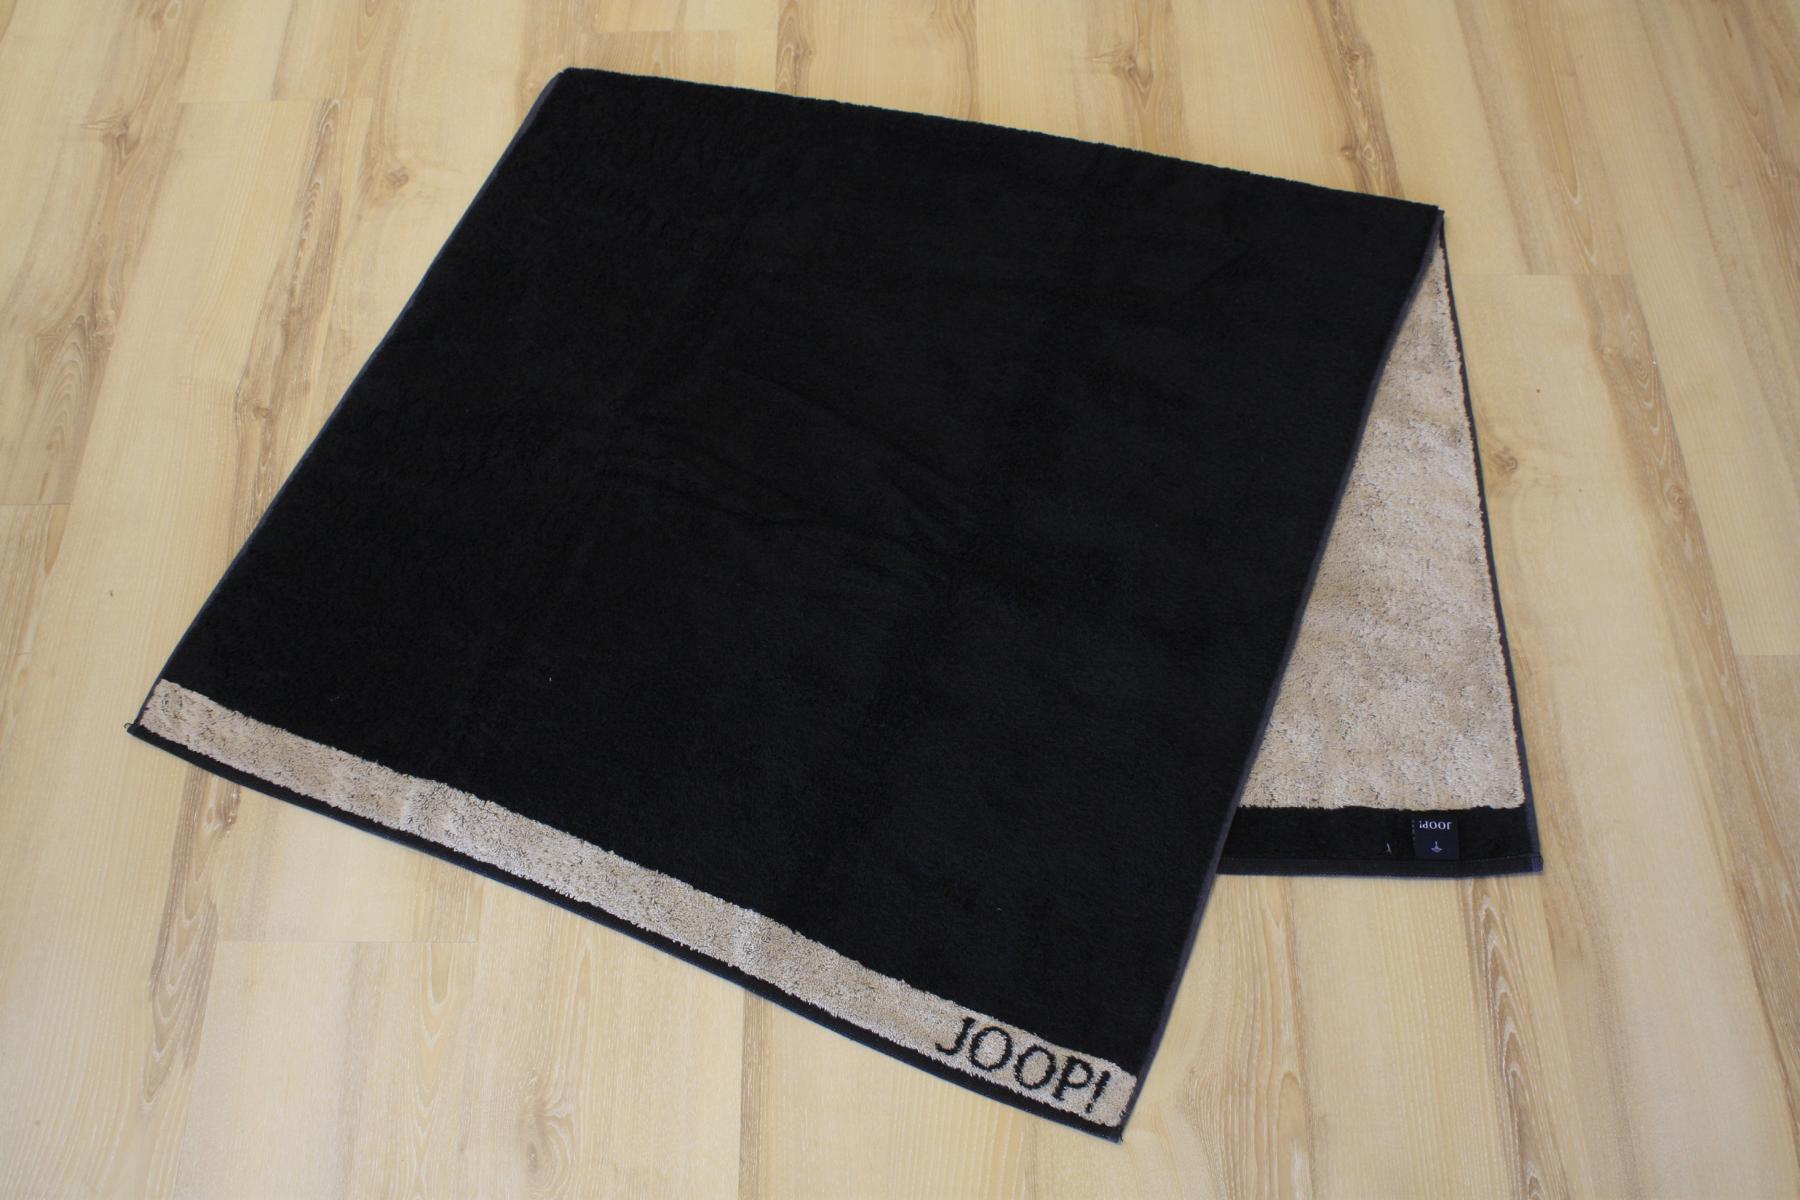 joop duschtuch badetuch 1651 doubleface 93 schwarz 80x150cm ebay. Black Bedroom Furniture Sets. Home Design Ideas